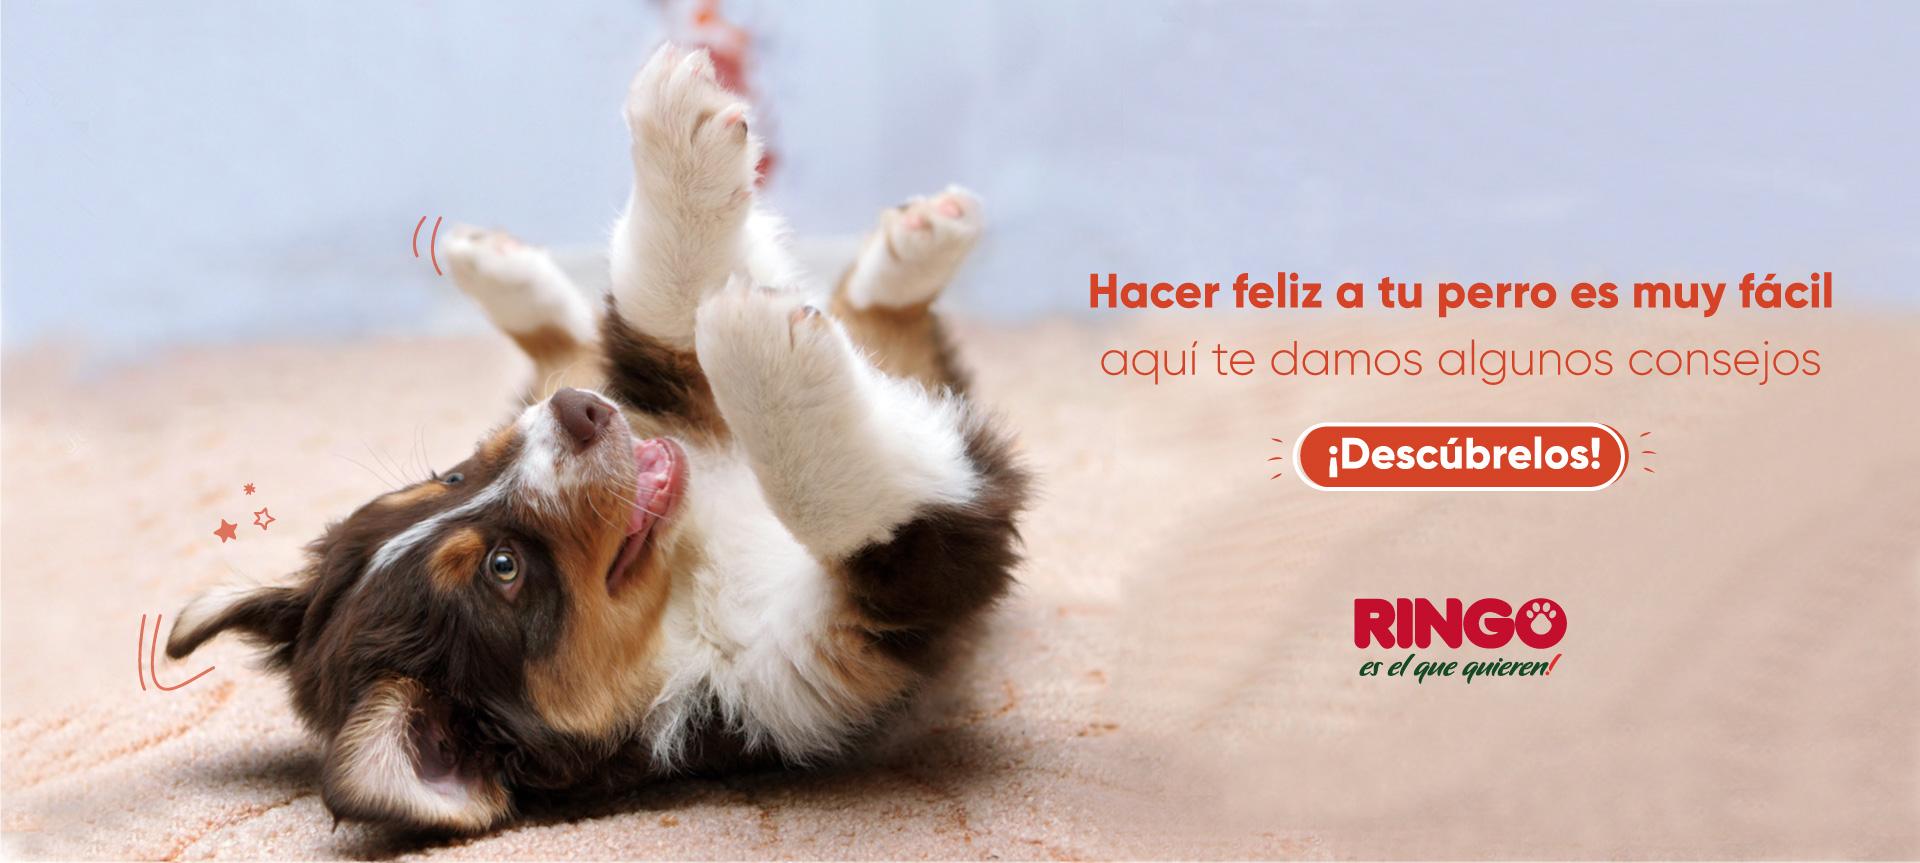 Haz feliz a tu perro